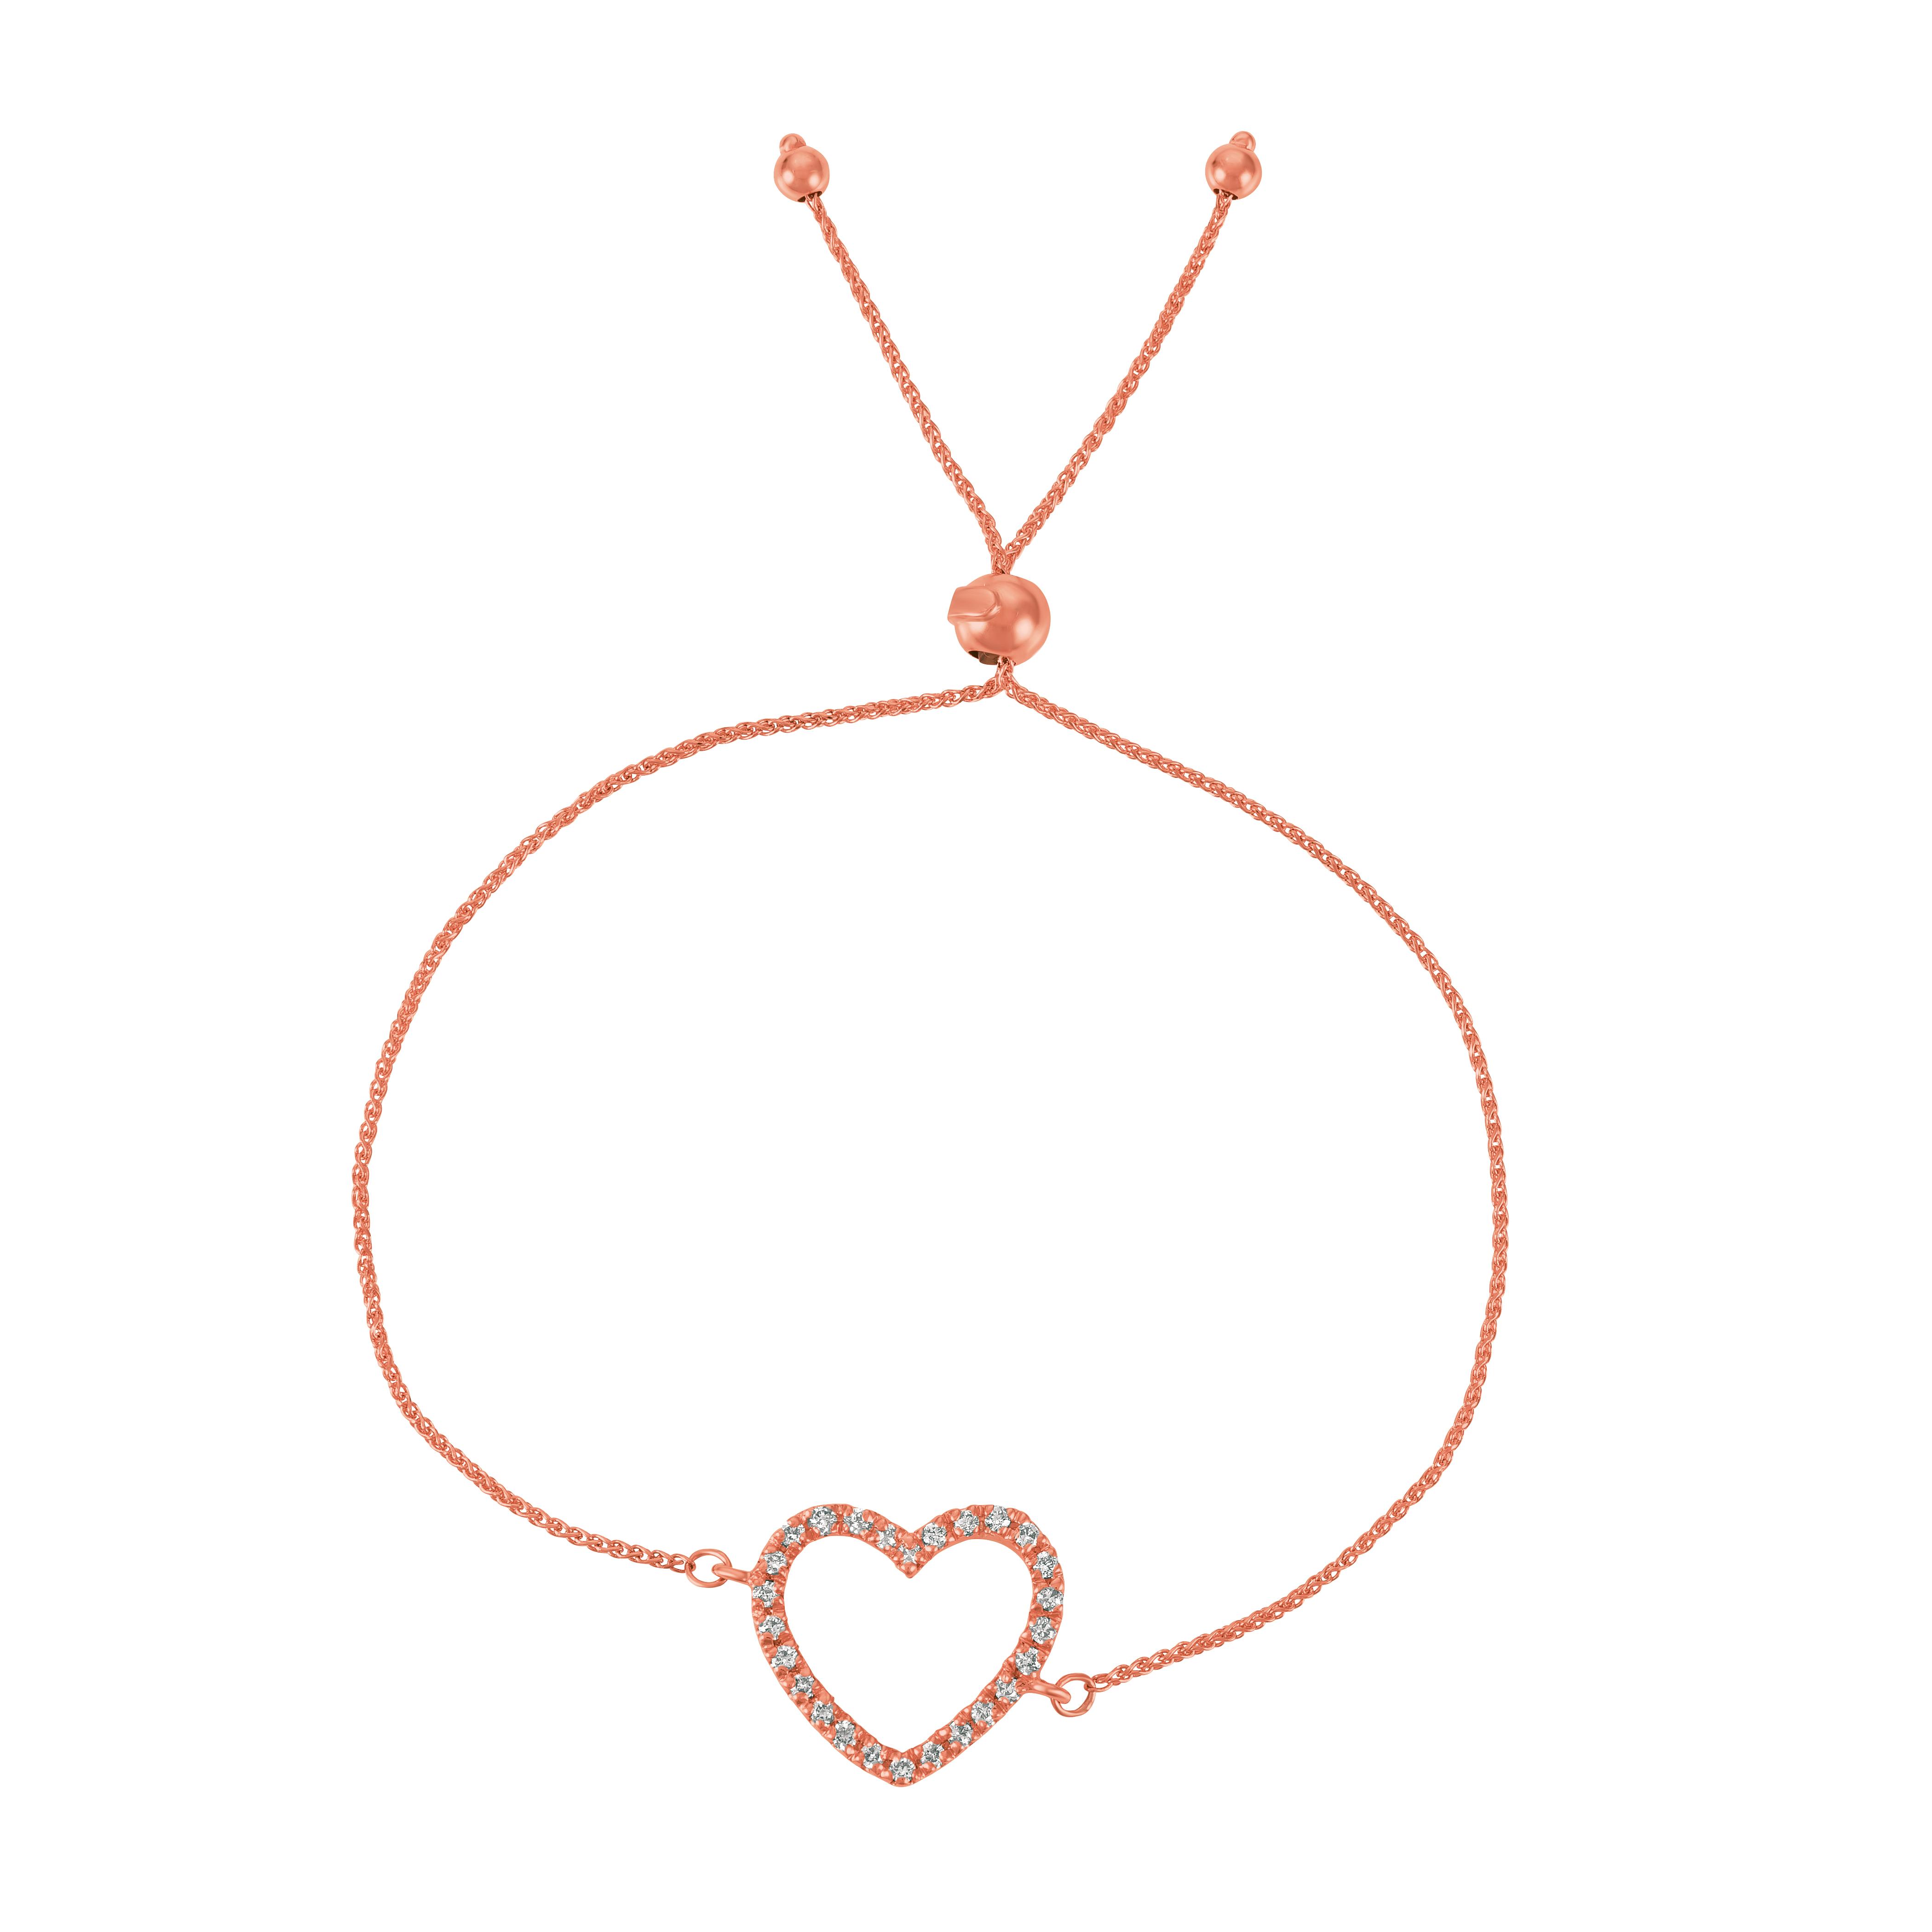 Bolo Diamond Heart Adjustable Bracelet 14k Rose Gold (0.25ct)